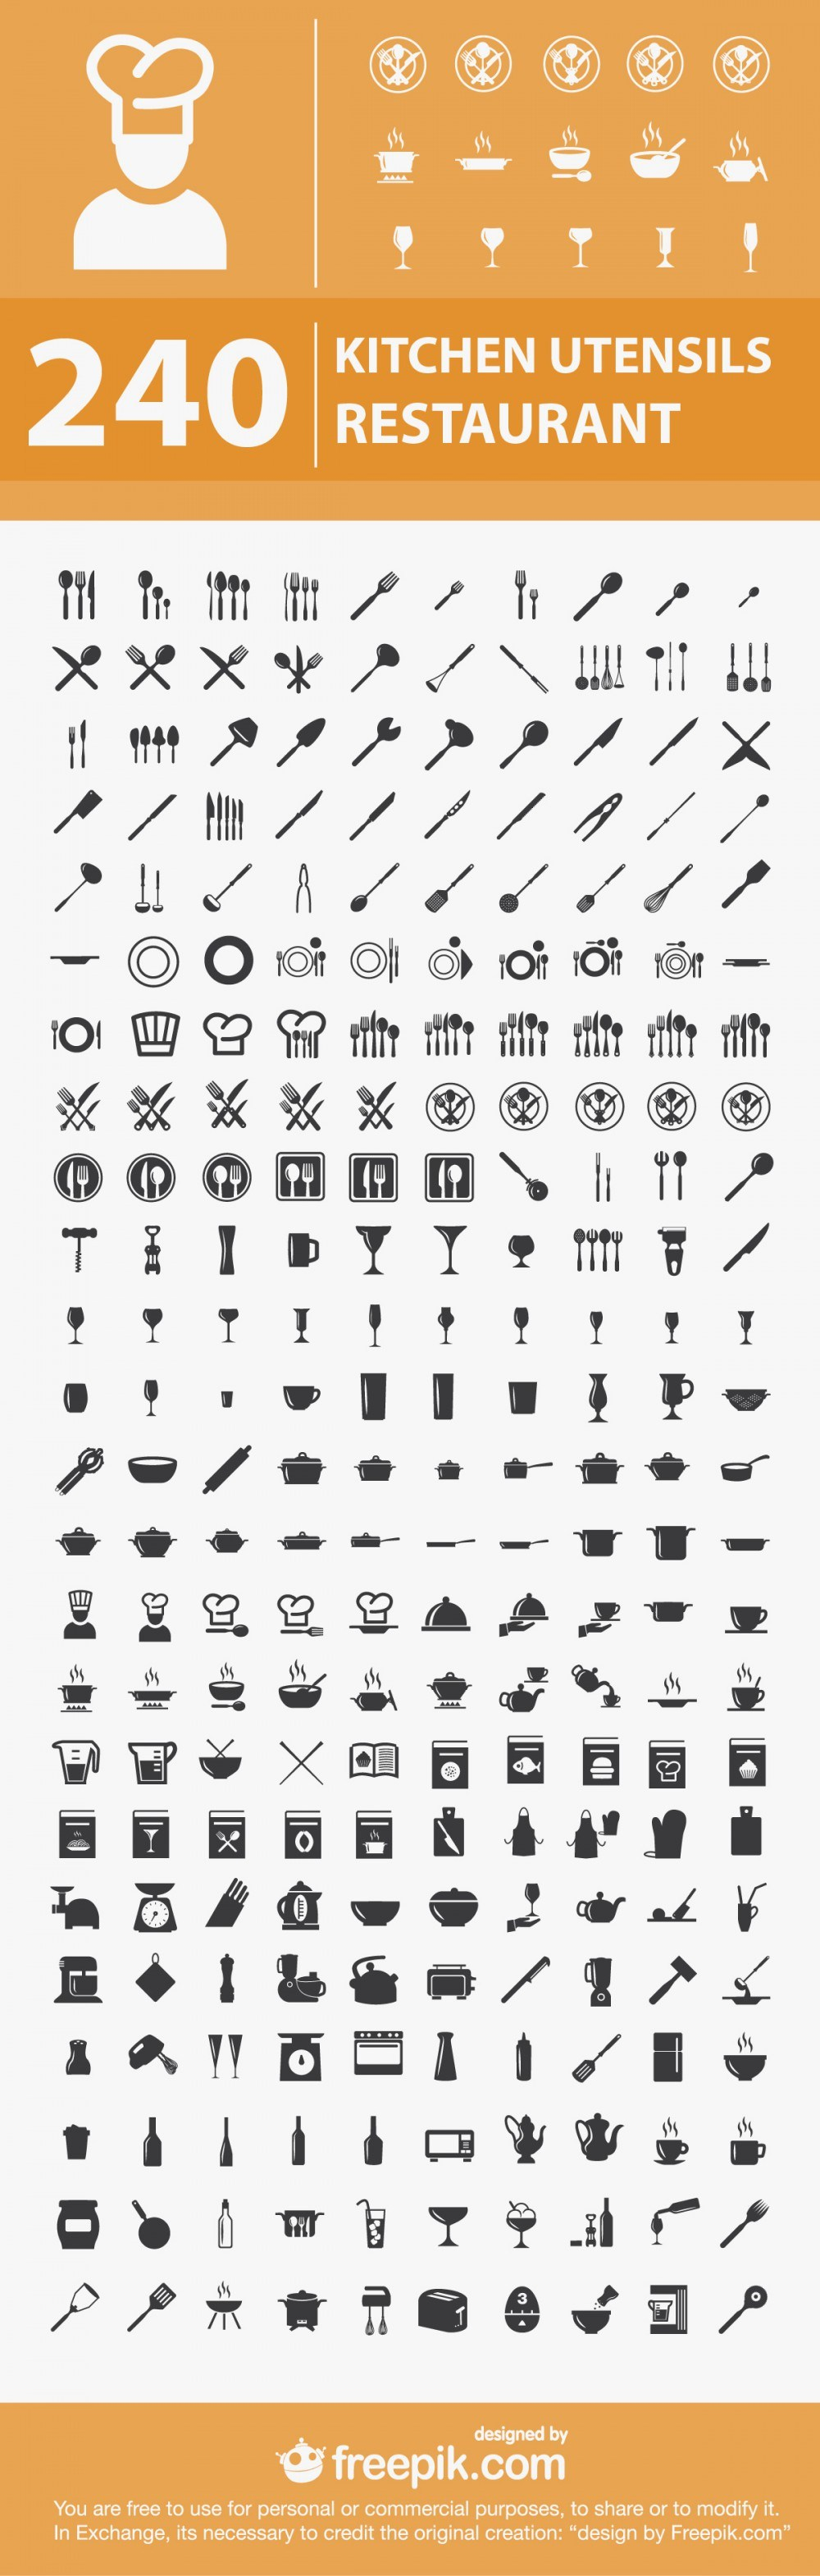 240-free-kitchen-restaurant-icons